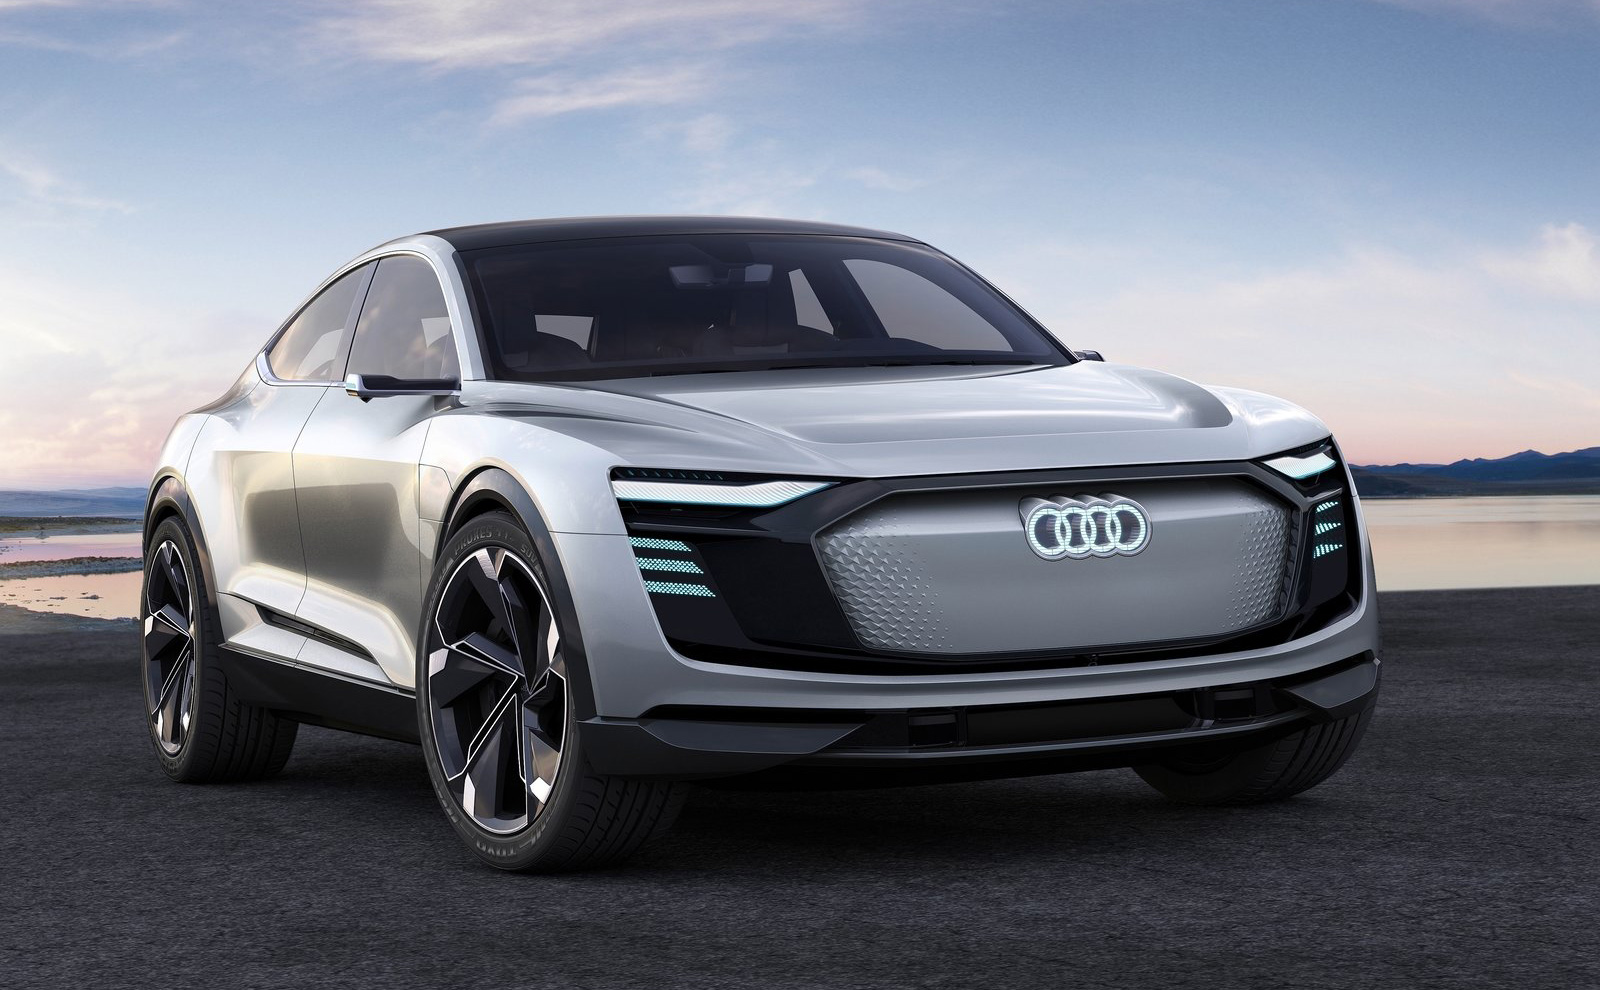 Audi-e-tron_Sportback_Concept-2017-1600-01.jpg